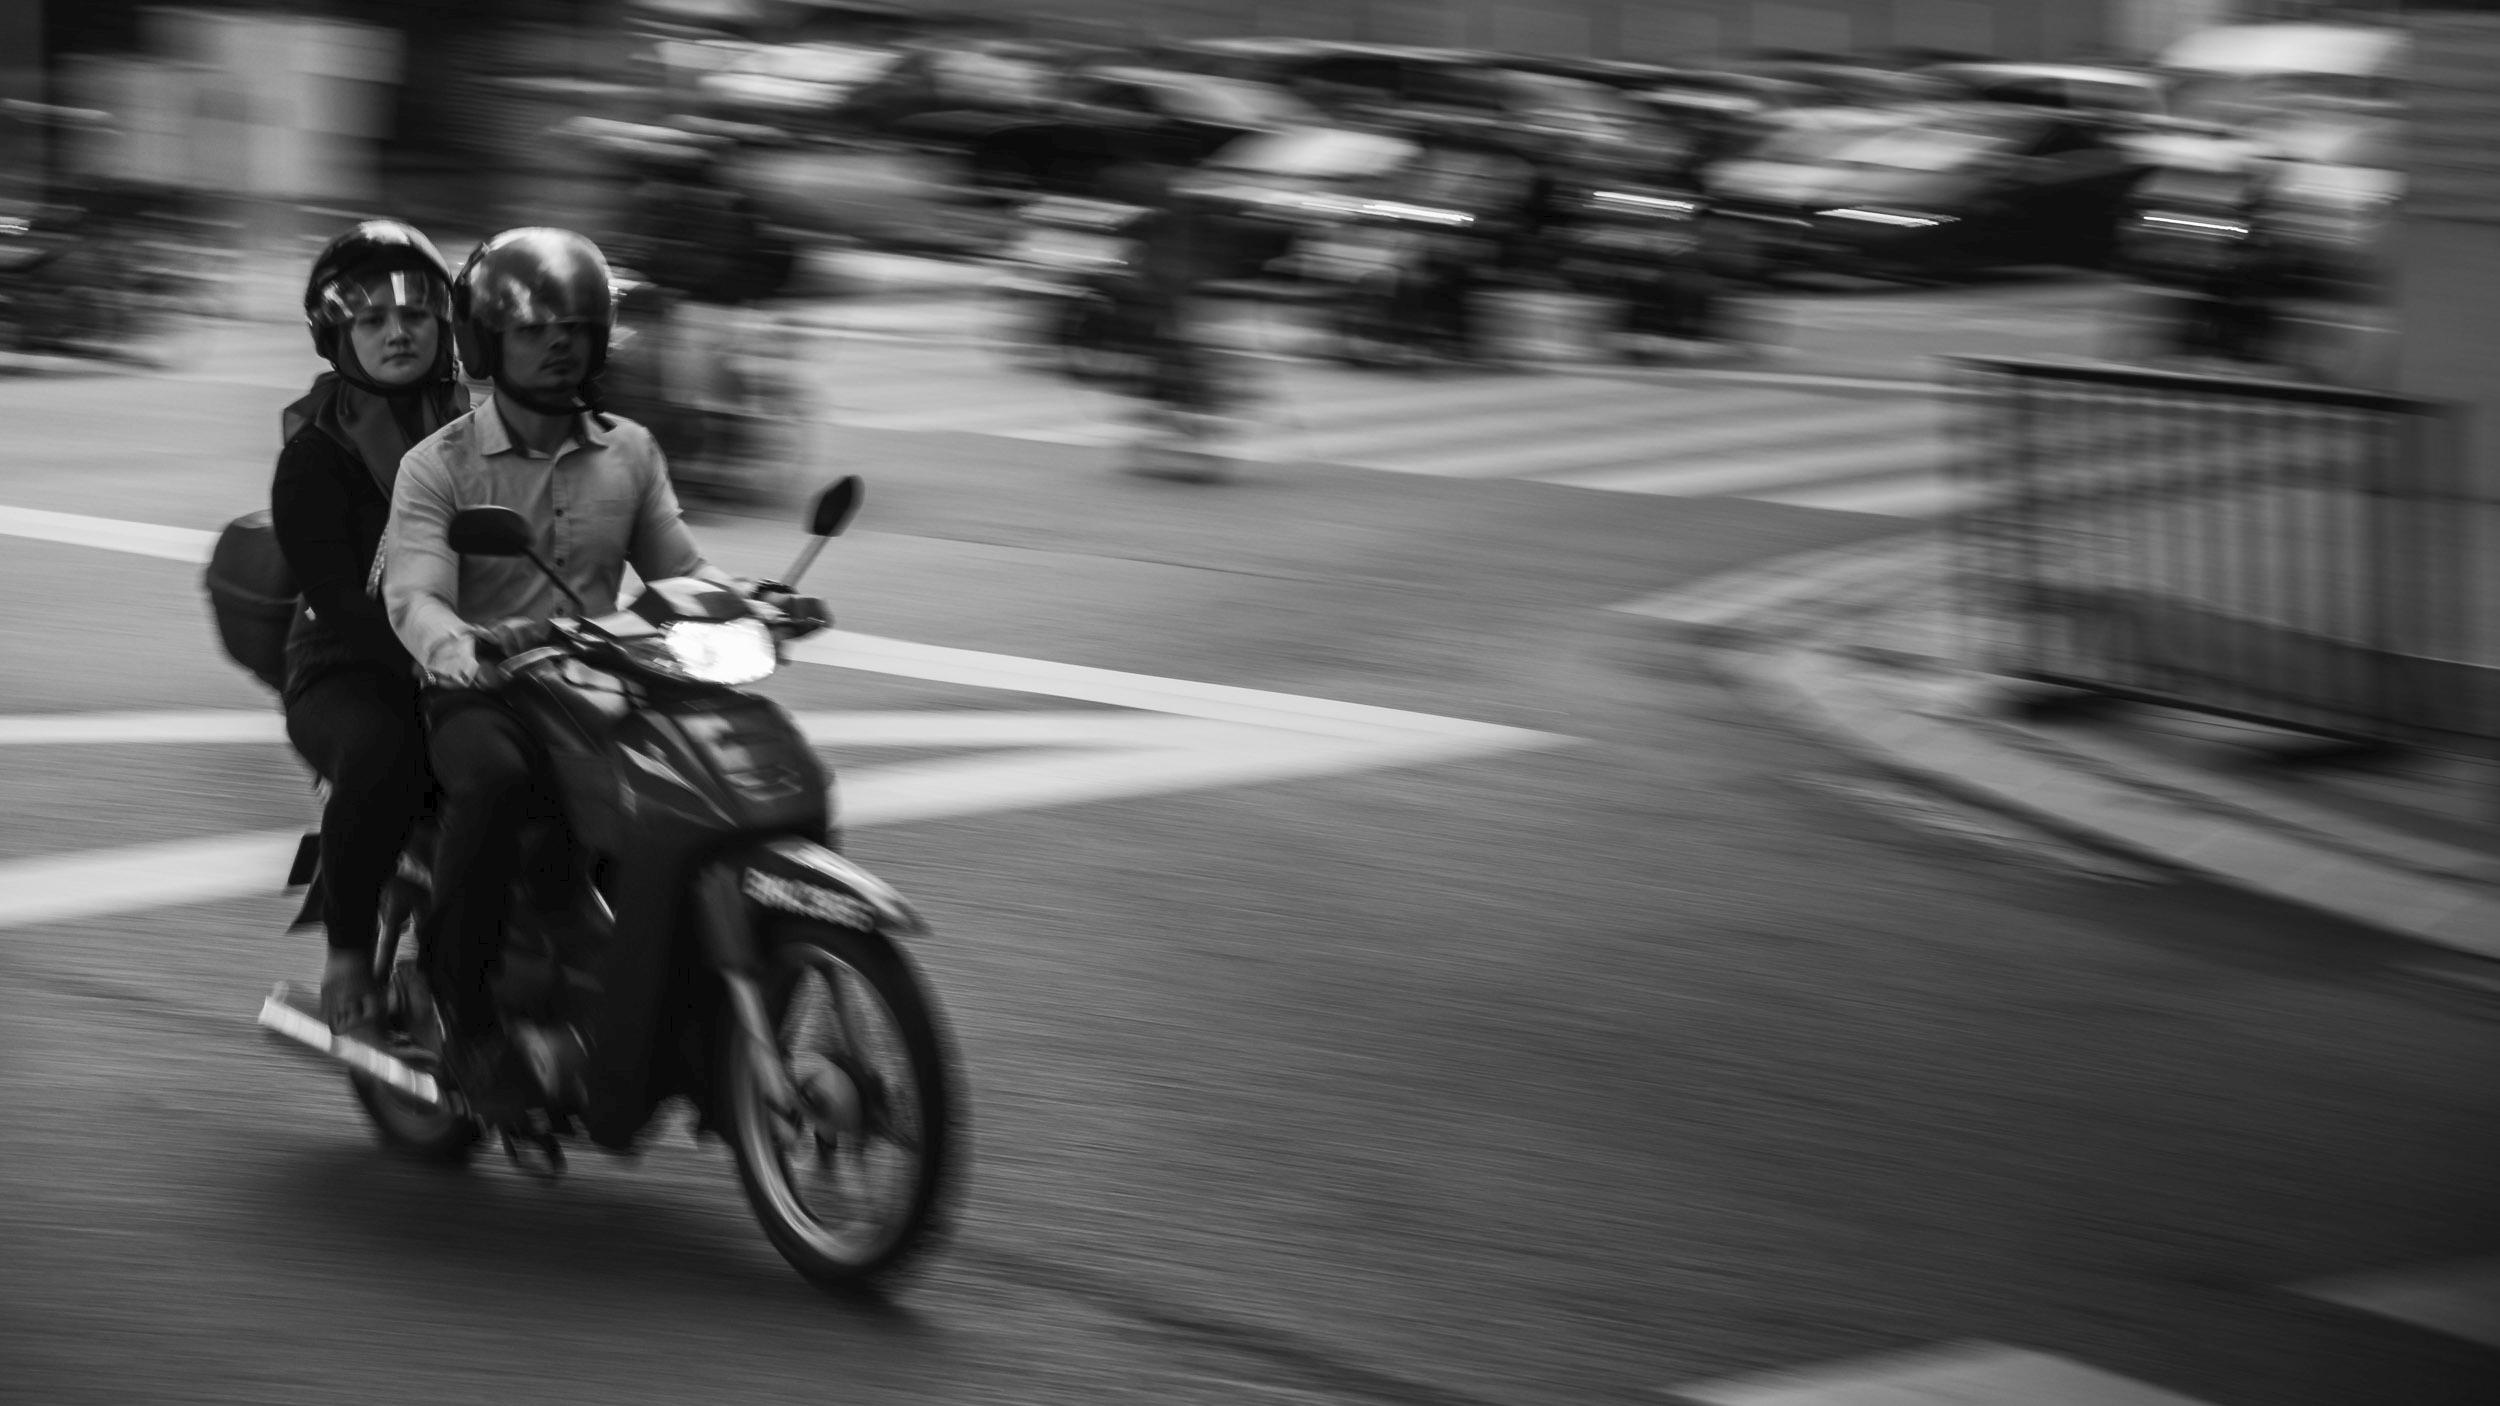 KL Speedster, Malaysia 2017 - streetphotography - travischau | ello